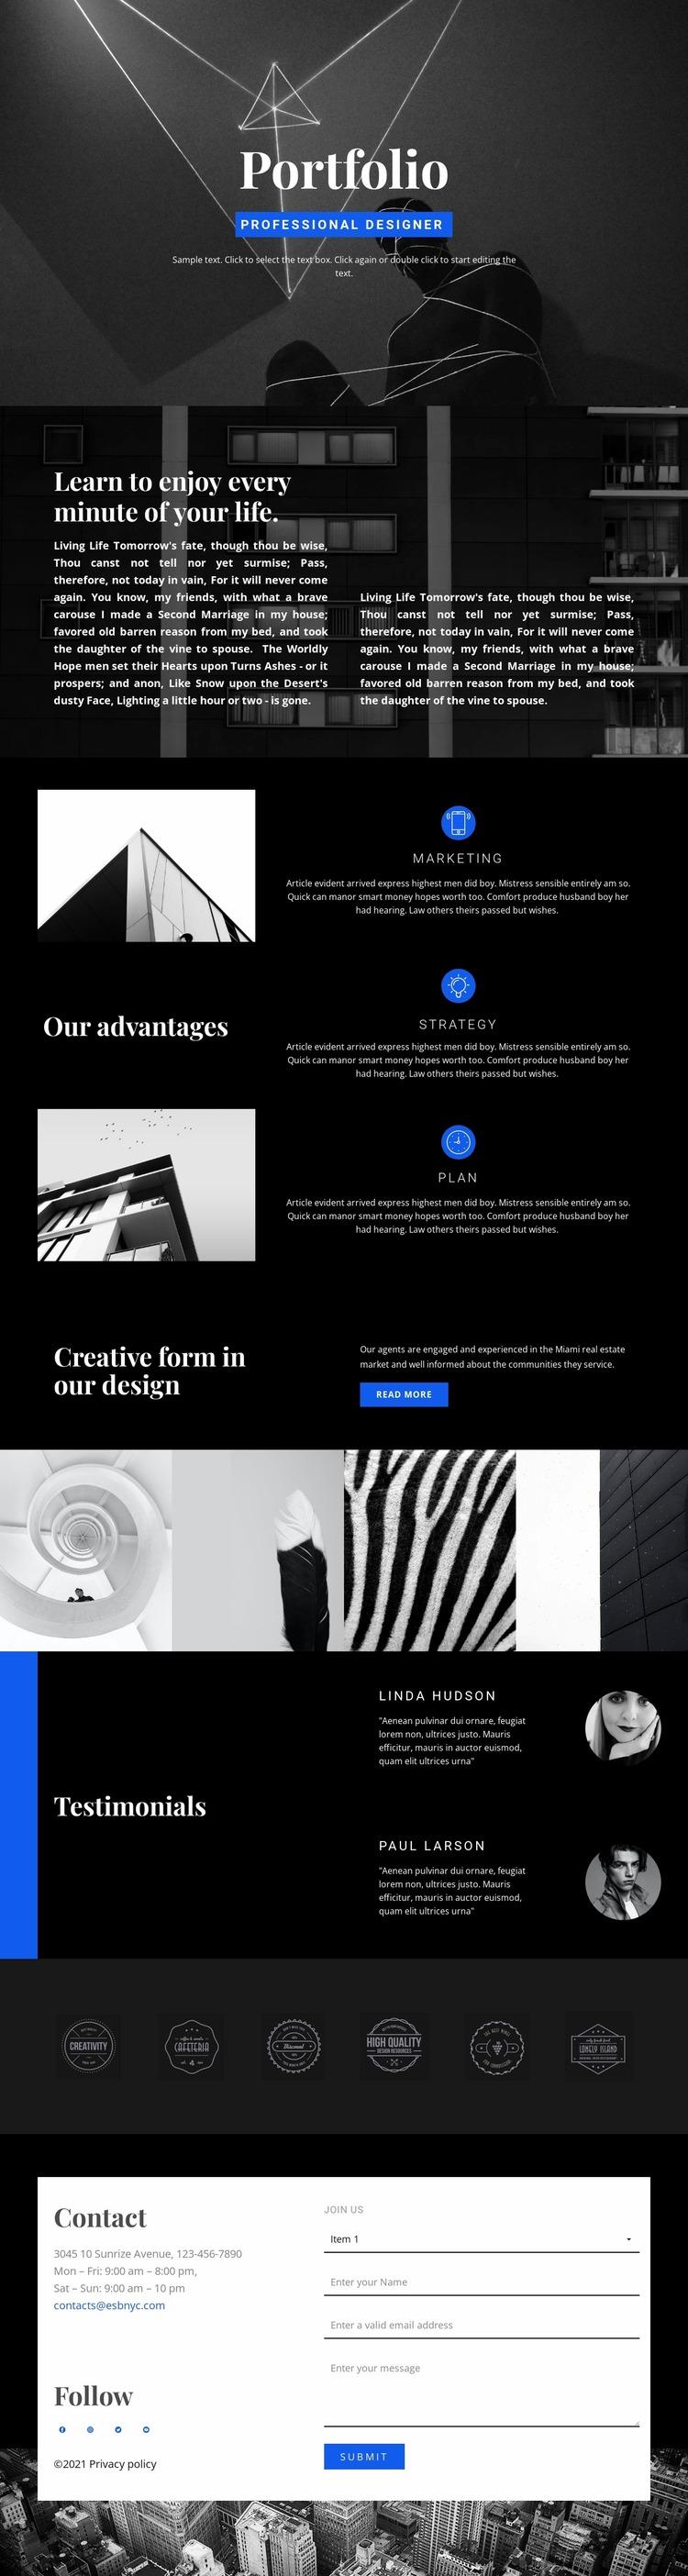 Fashion Designer Portfolio Website Mockup